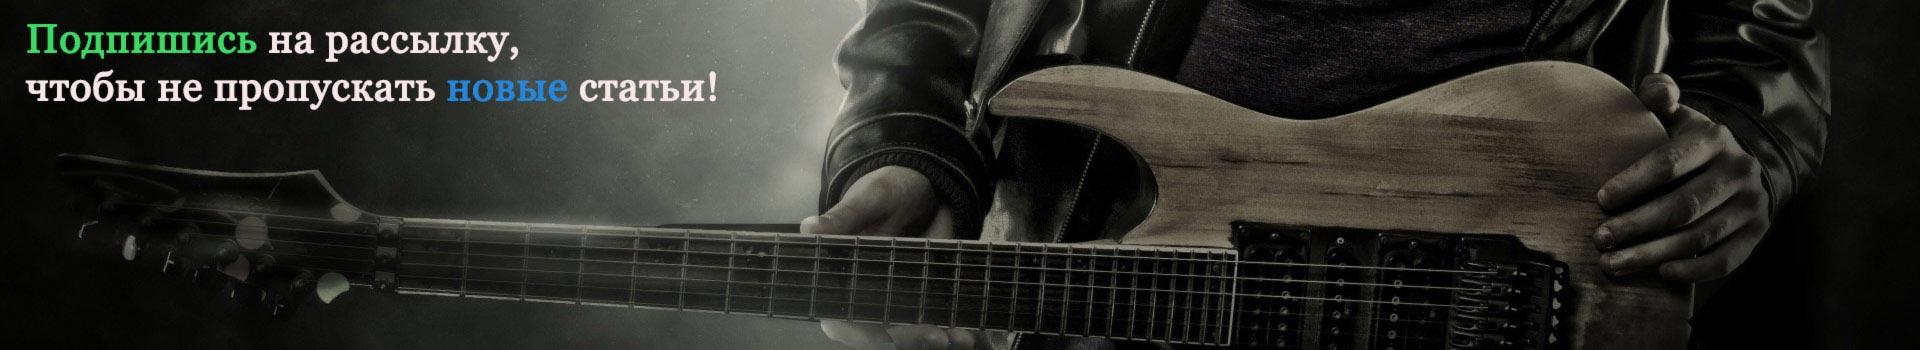 Рубрика: История рок-хита